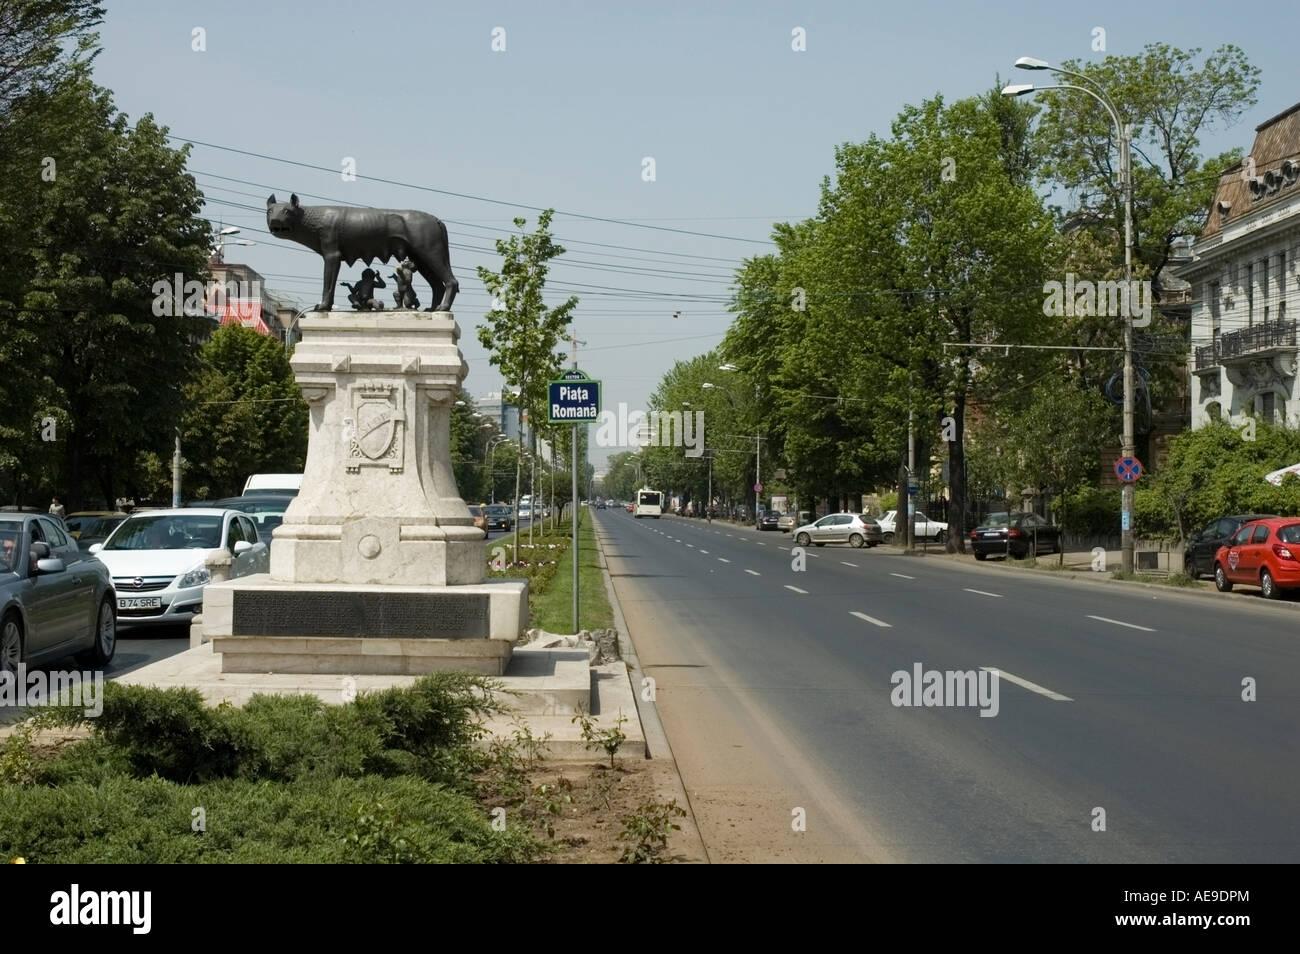 Romulus Remus statue, tree lined avenue, Piata Romana, Bucharest, Romania, Europe, EU - Stock Image